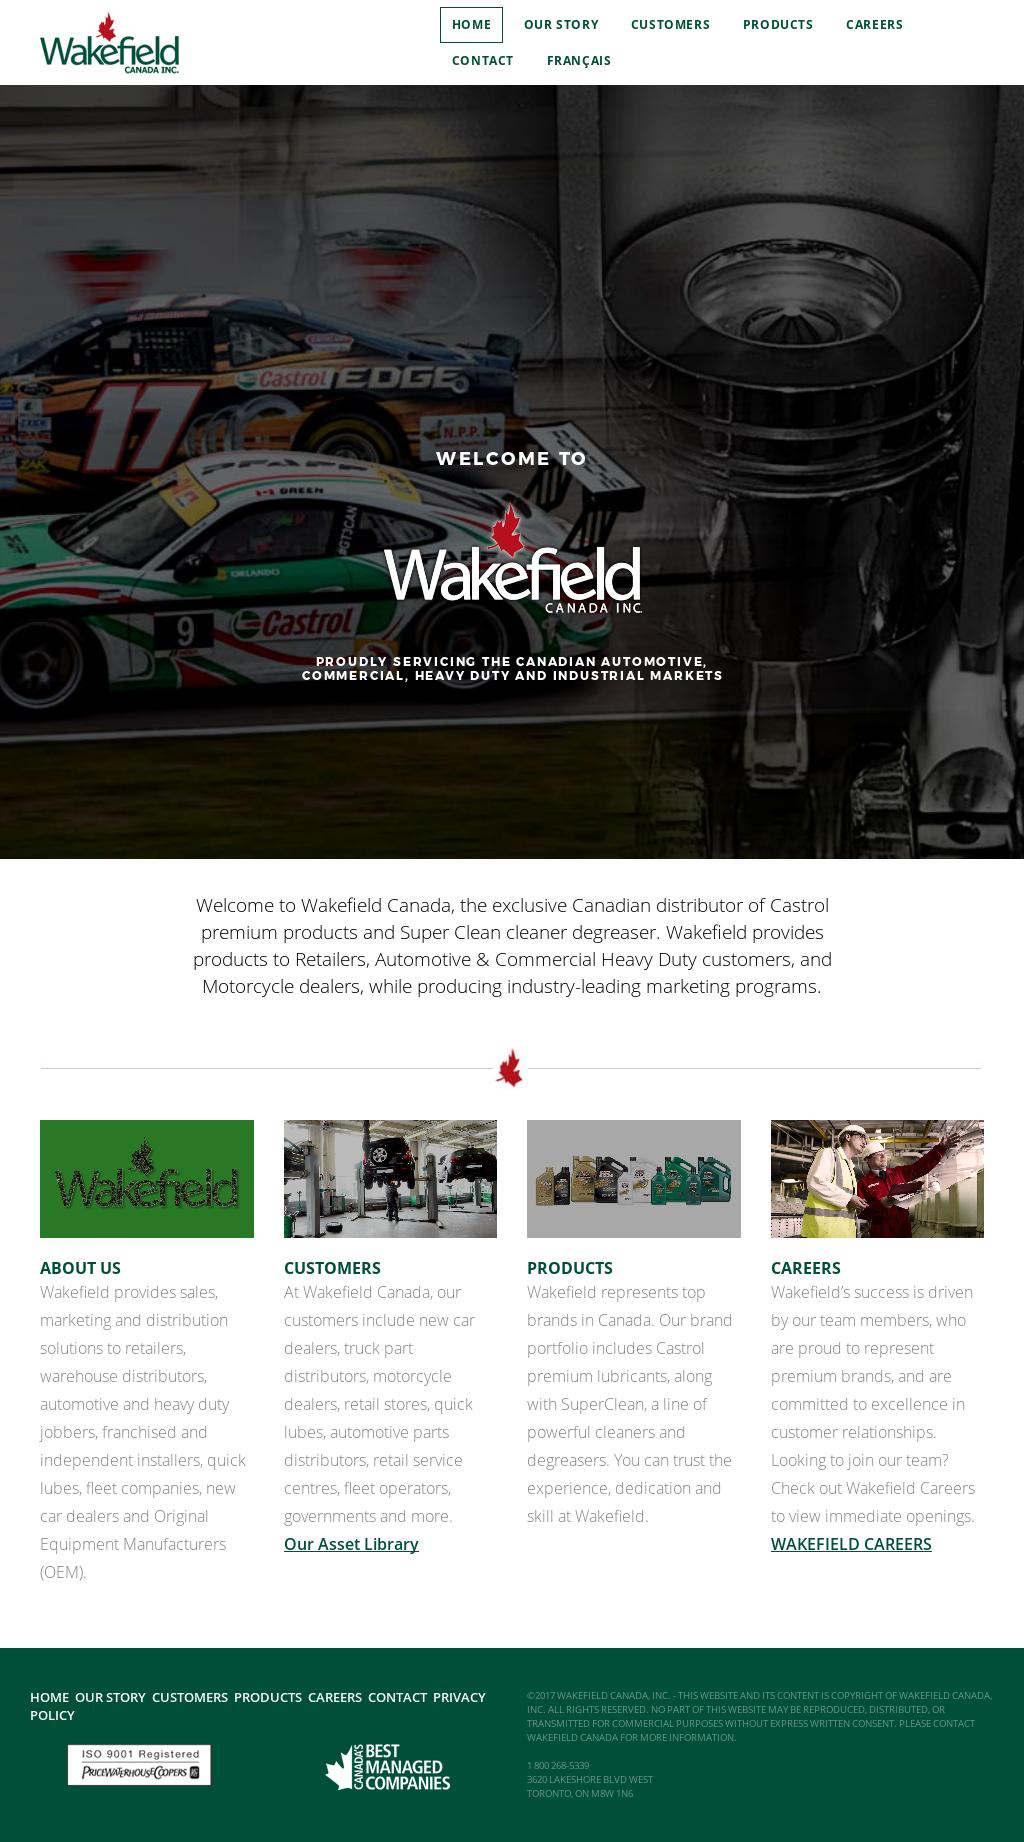 Wakefieldcanada Competitors, Revenue and Employees - Owler